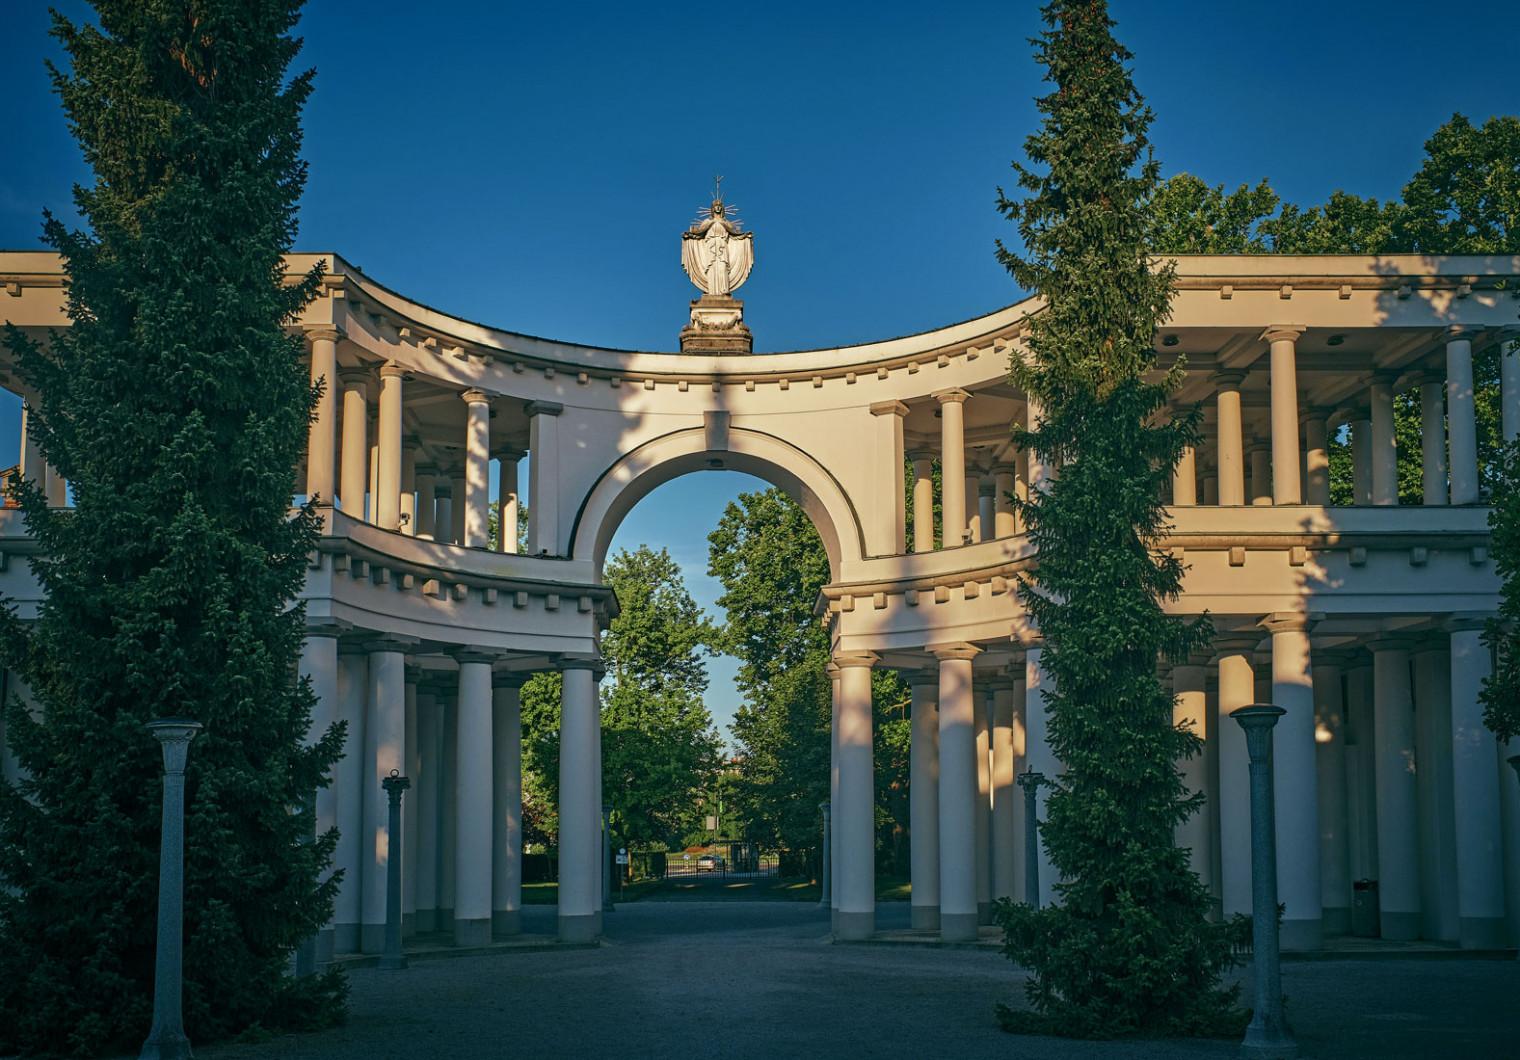 Plečnik's Žale - Garden of All Saints